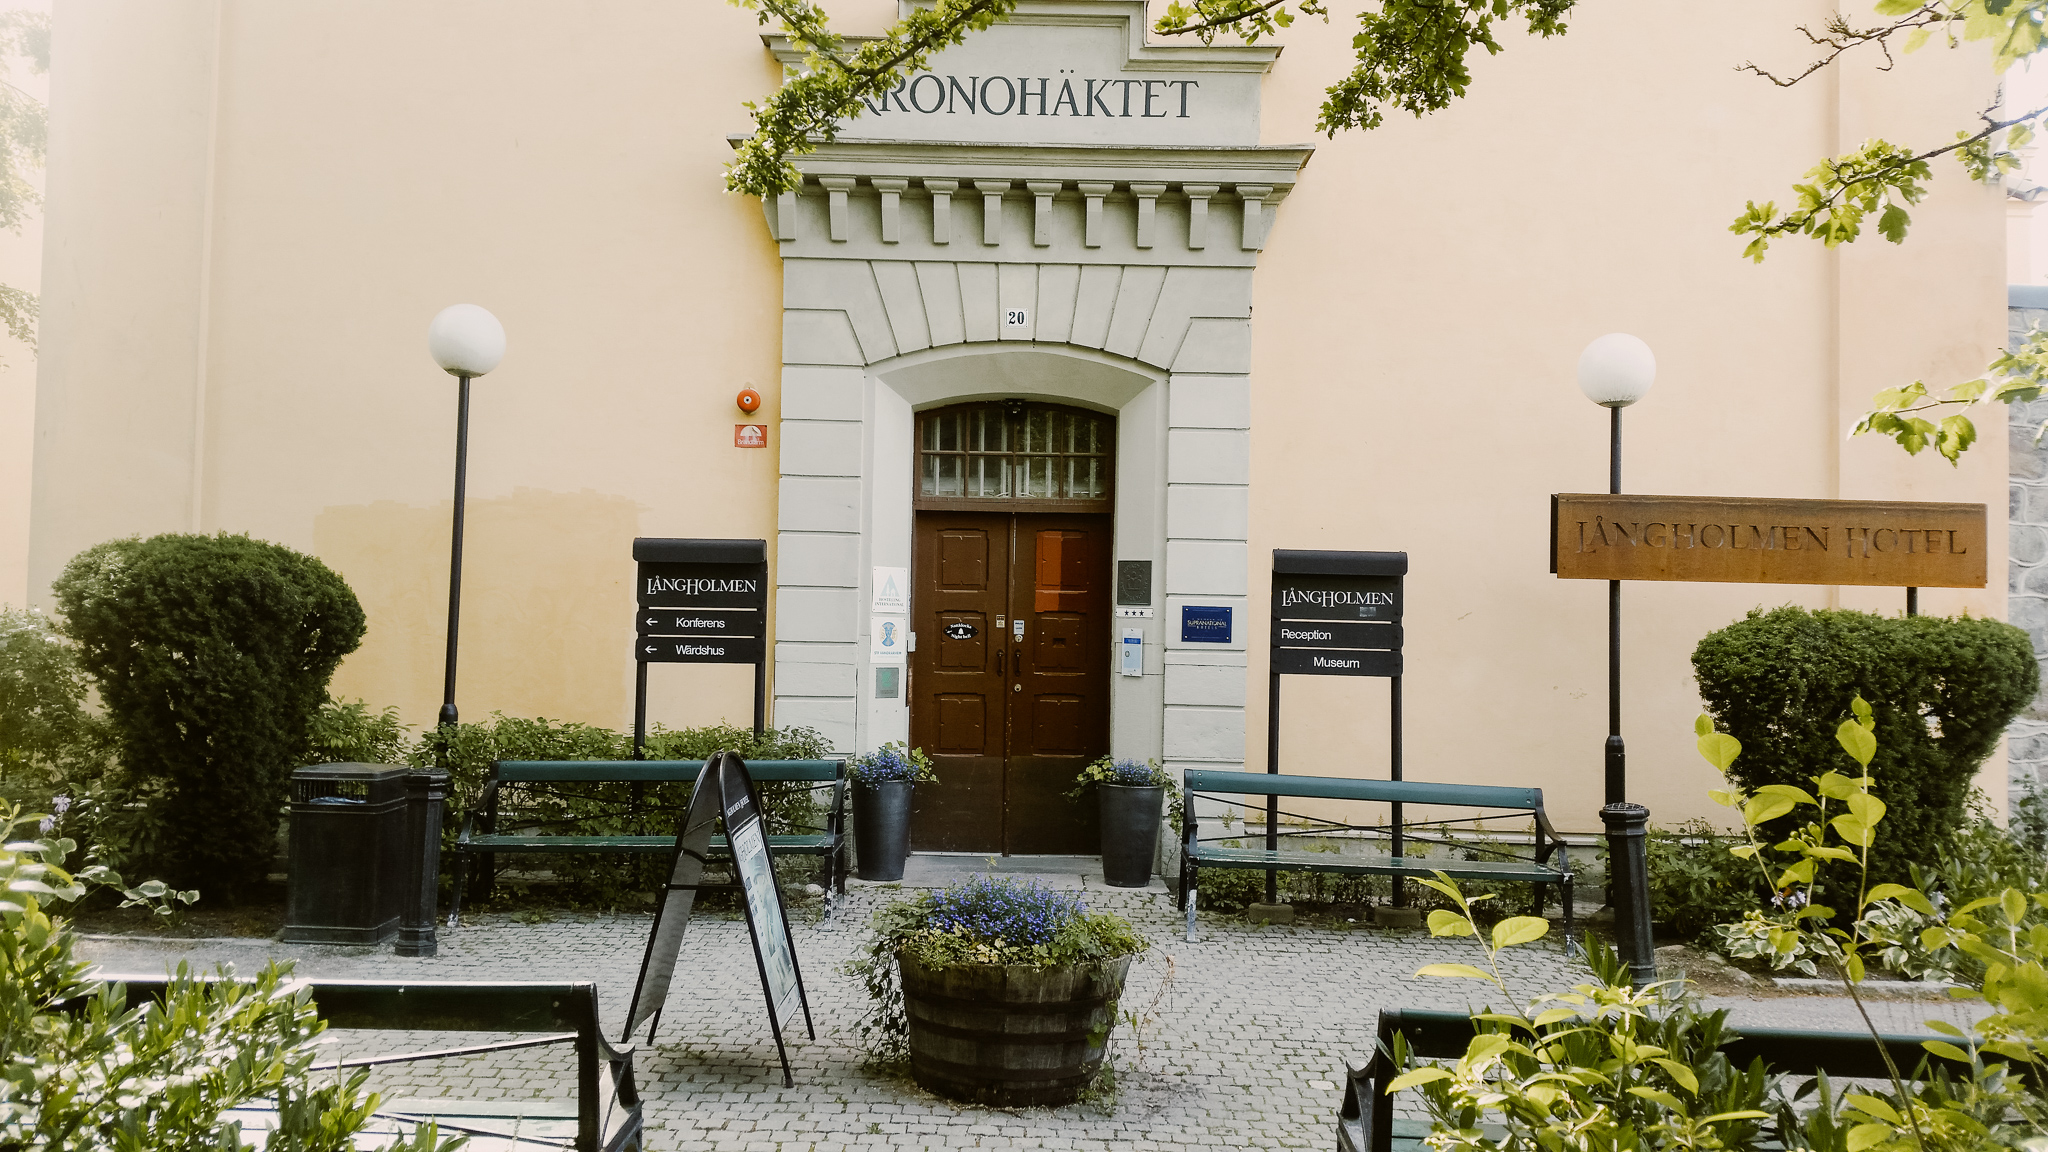 langholmen island prison